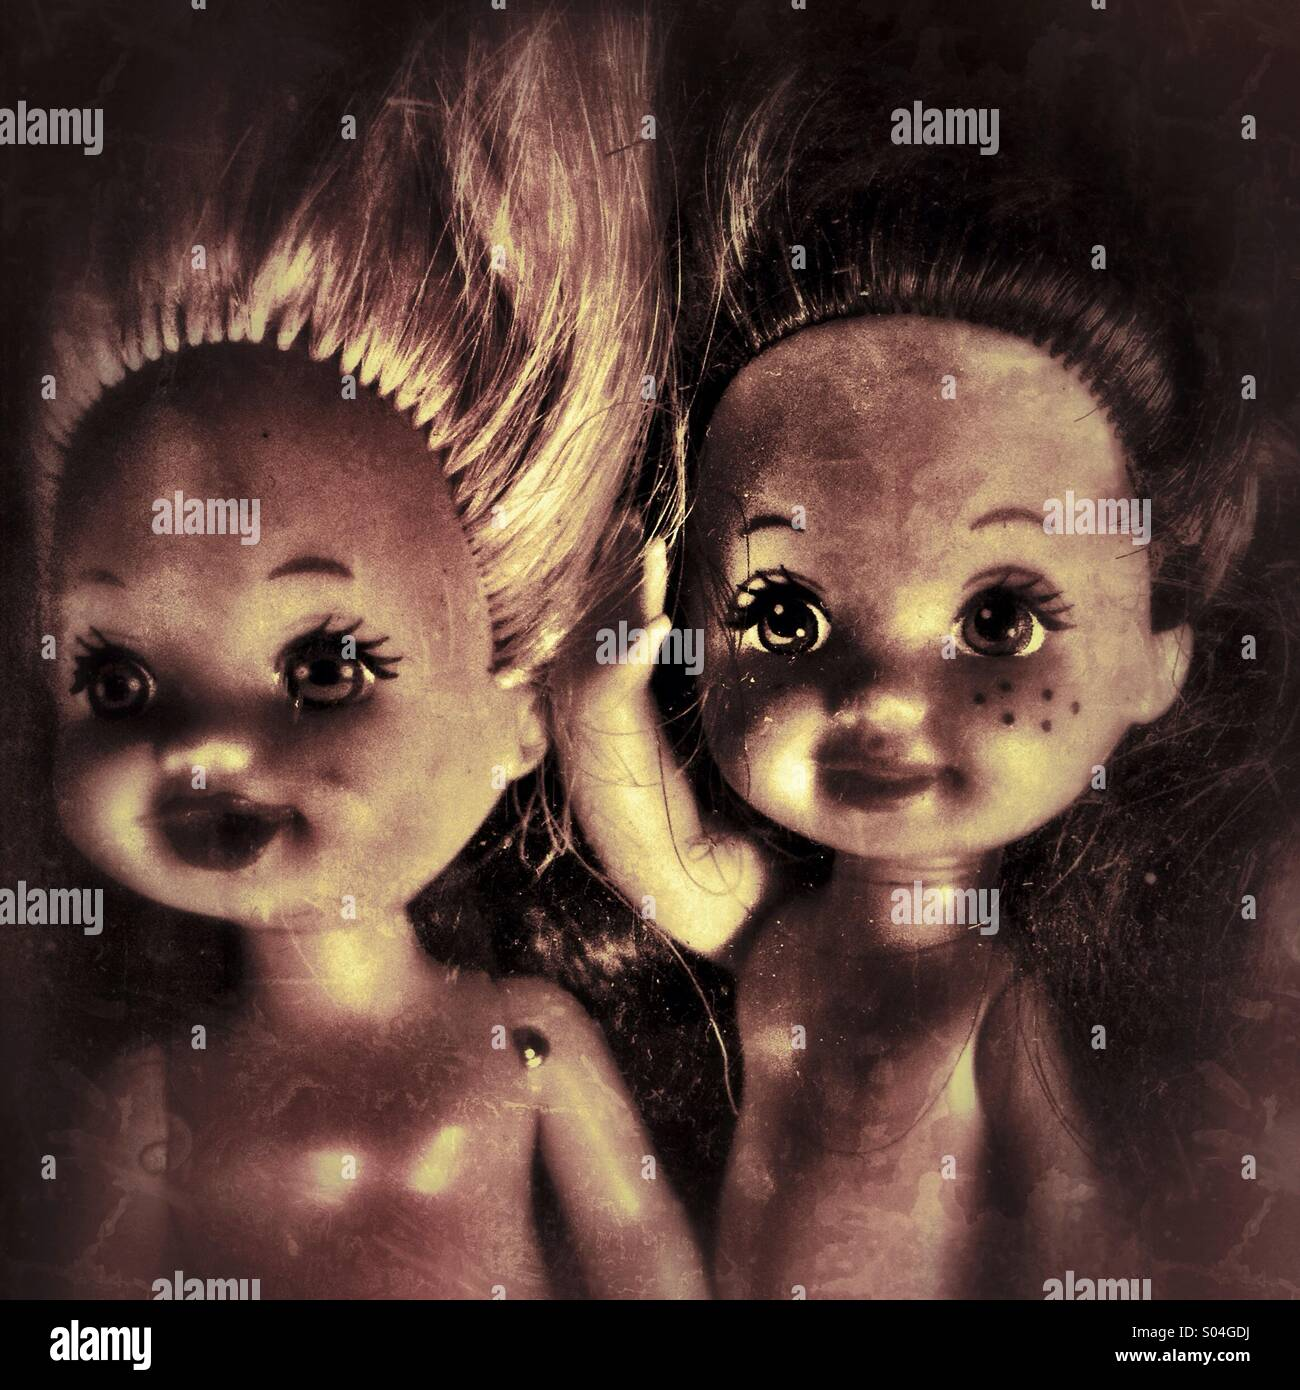 Petites Poupées creepy Photo Stock